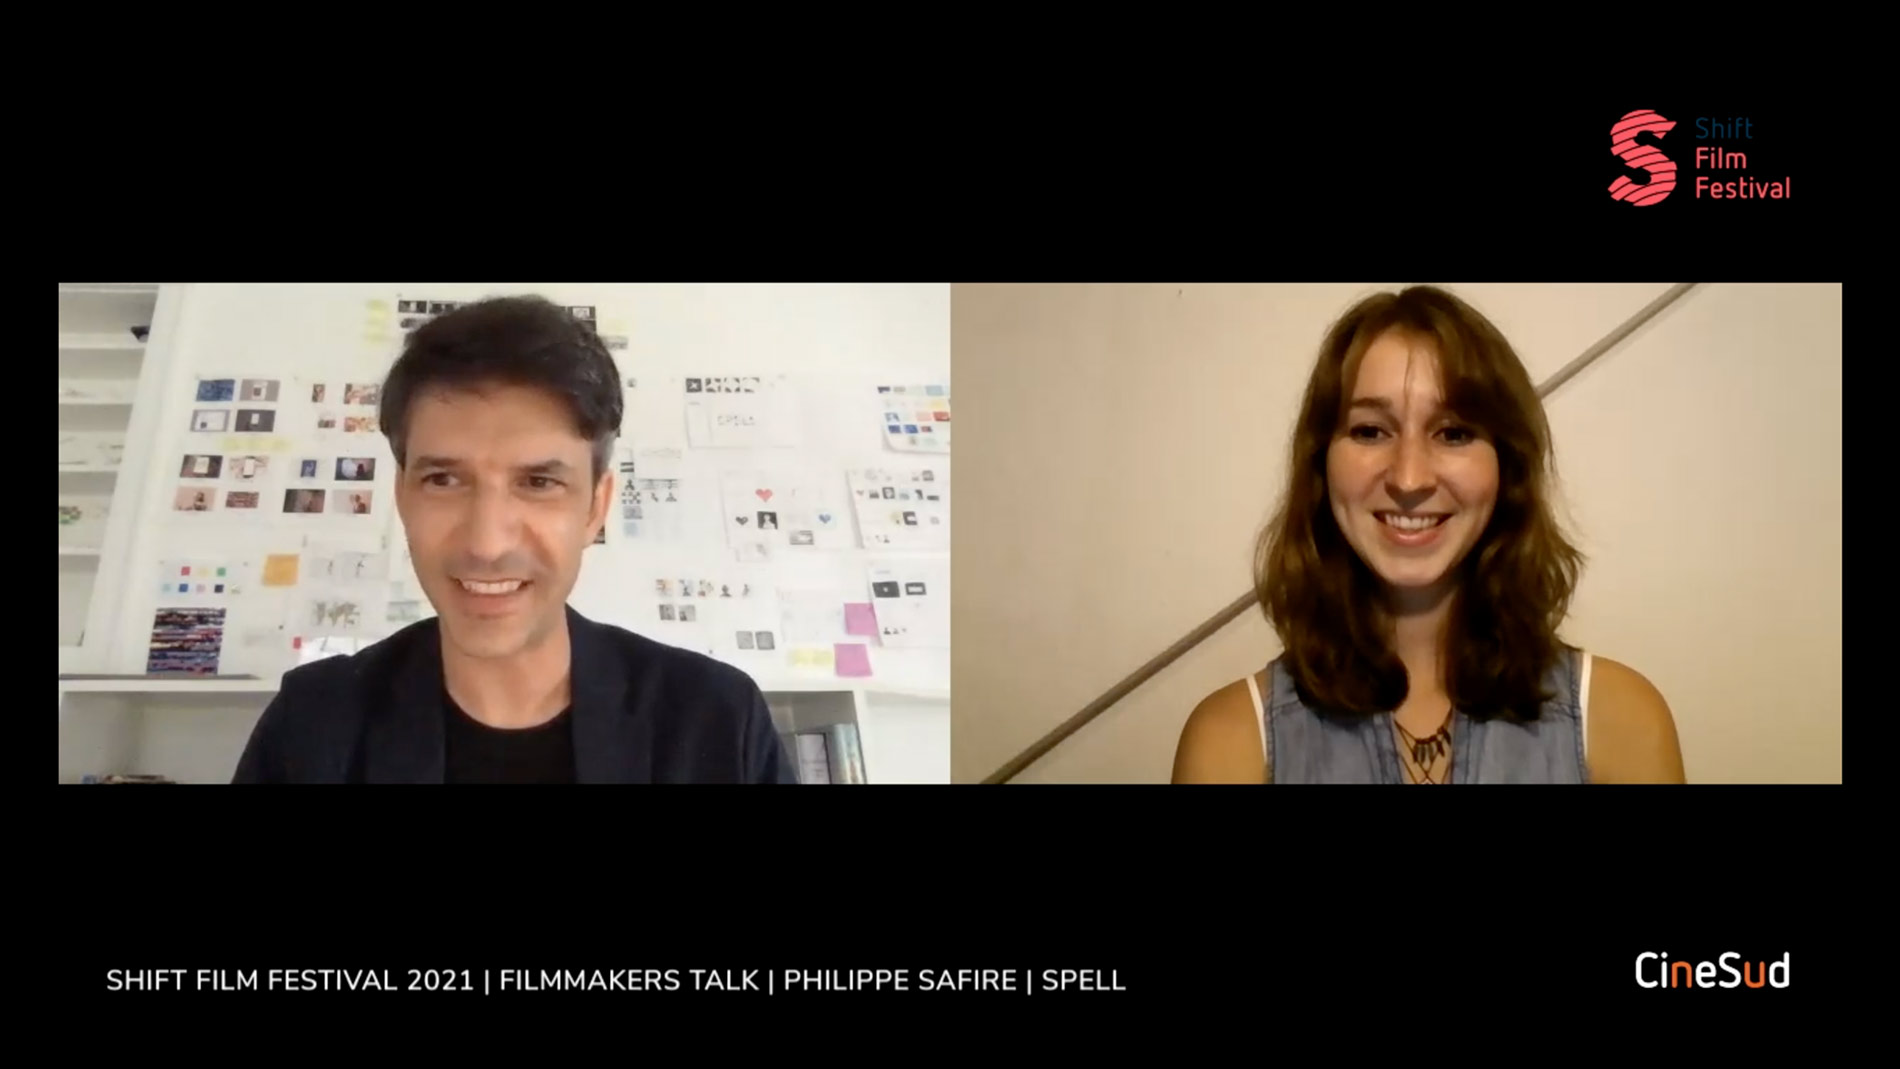 SHIFT Film Festival 2021   Filmmakers Talk